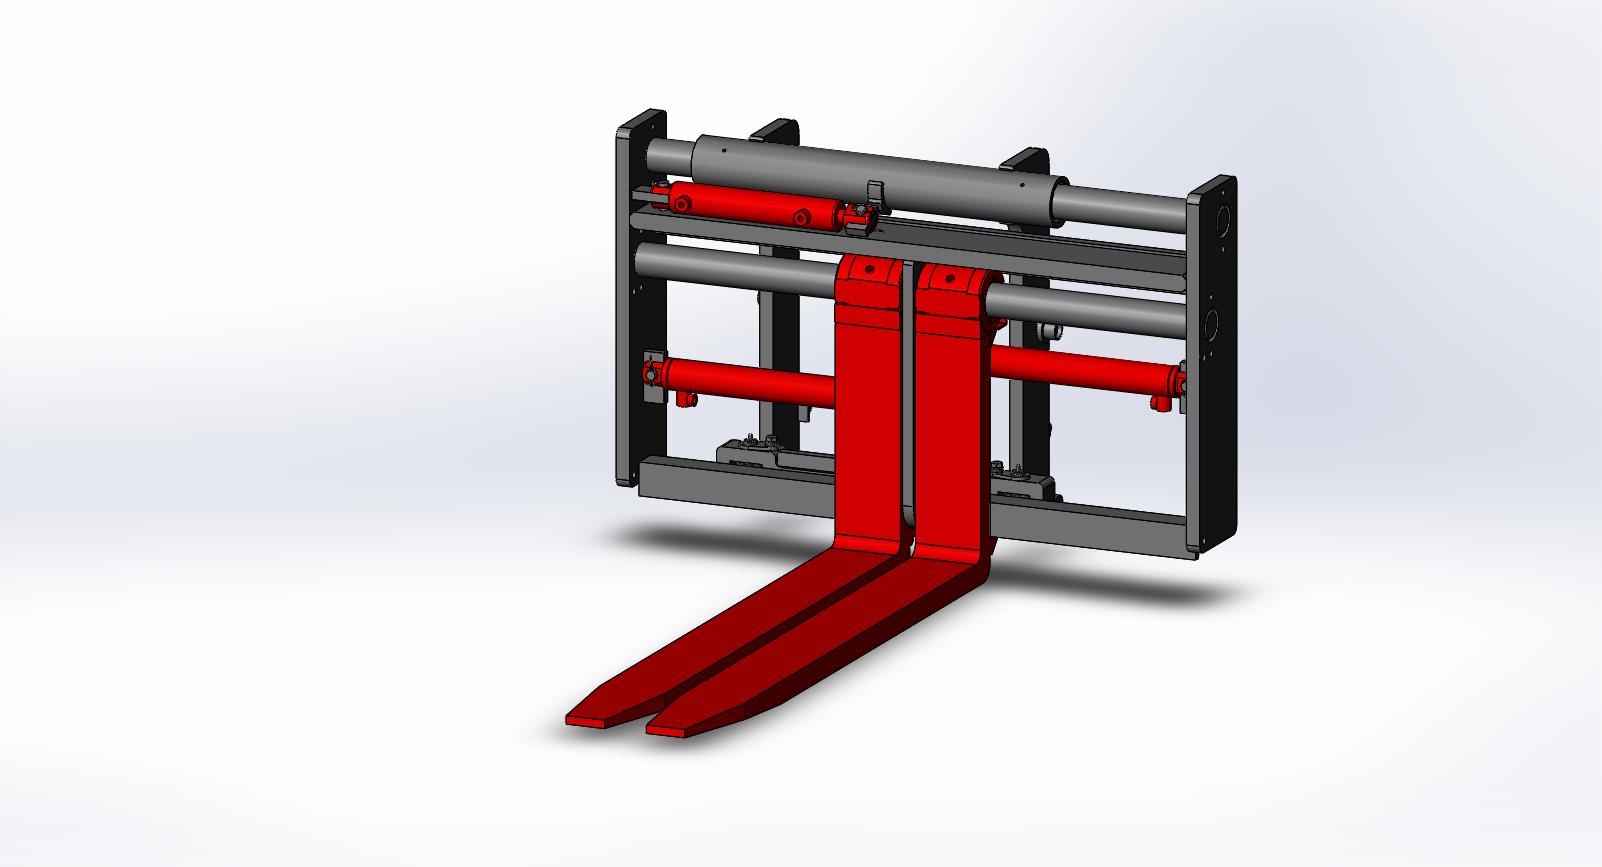 Axon Forklift: Heavy Duty Side shifter & Fork Positioners - Medium Duty